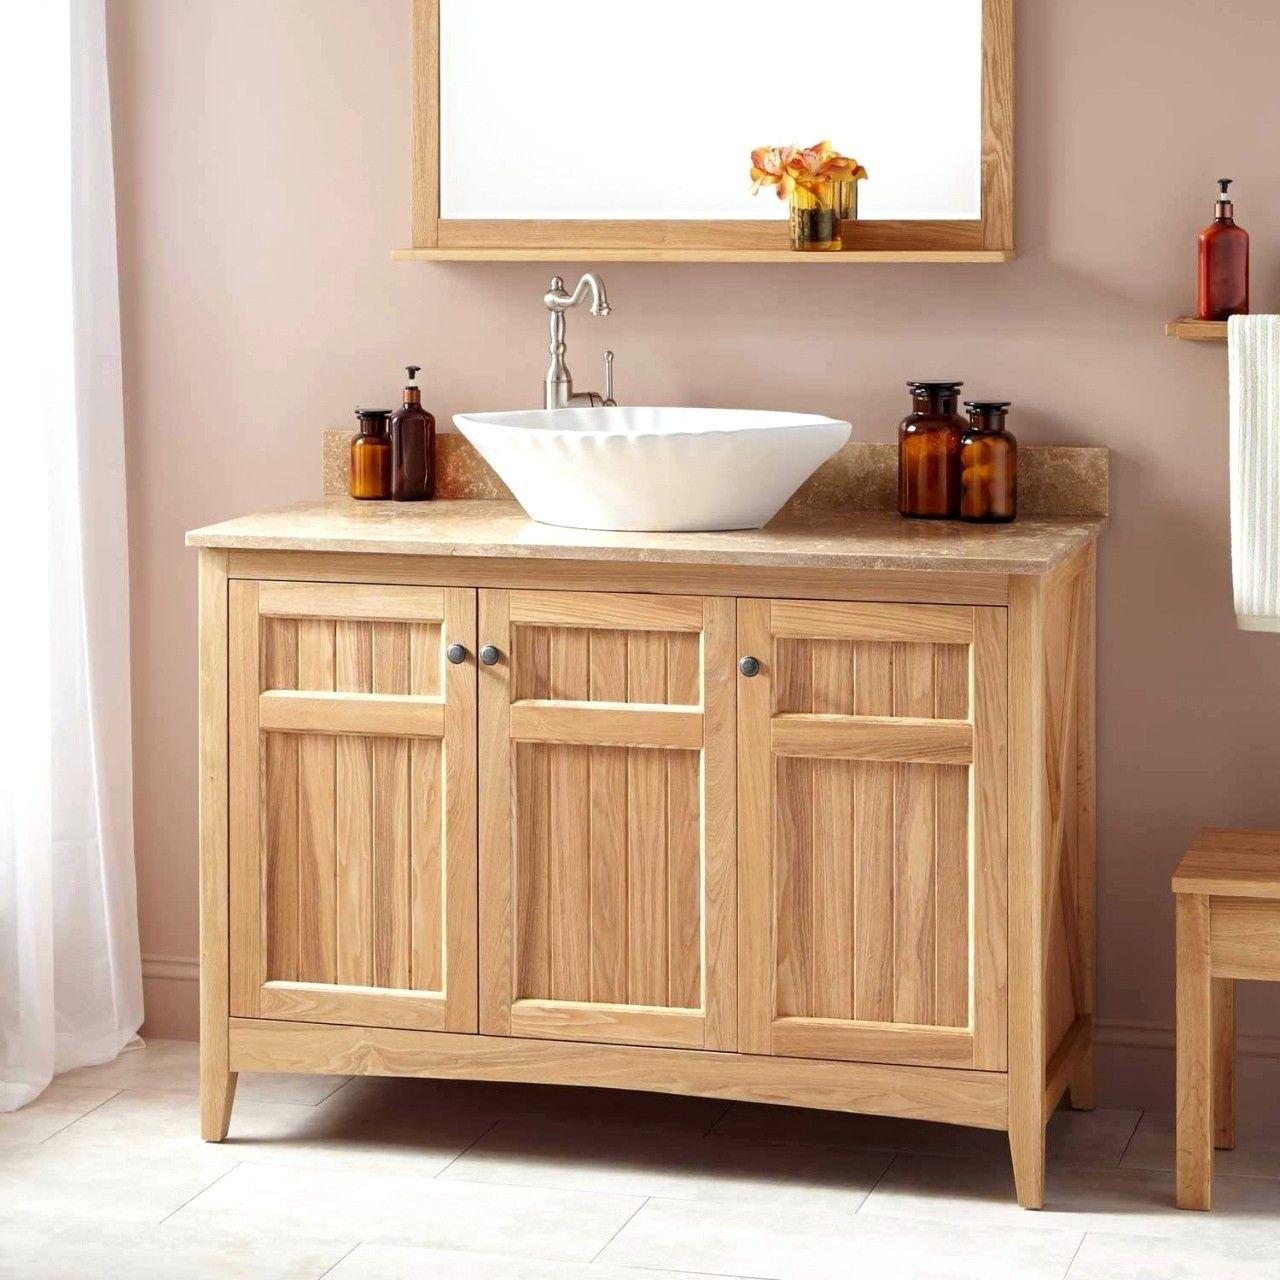 Best Bathroom Vanity Cabinet Colors In 2020 Bathroom Vanities 640 x 480